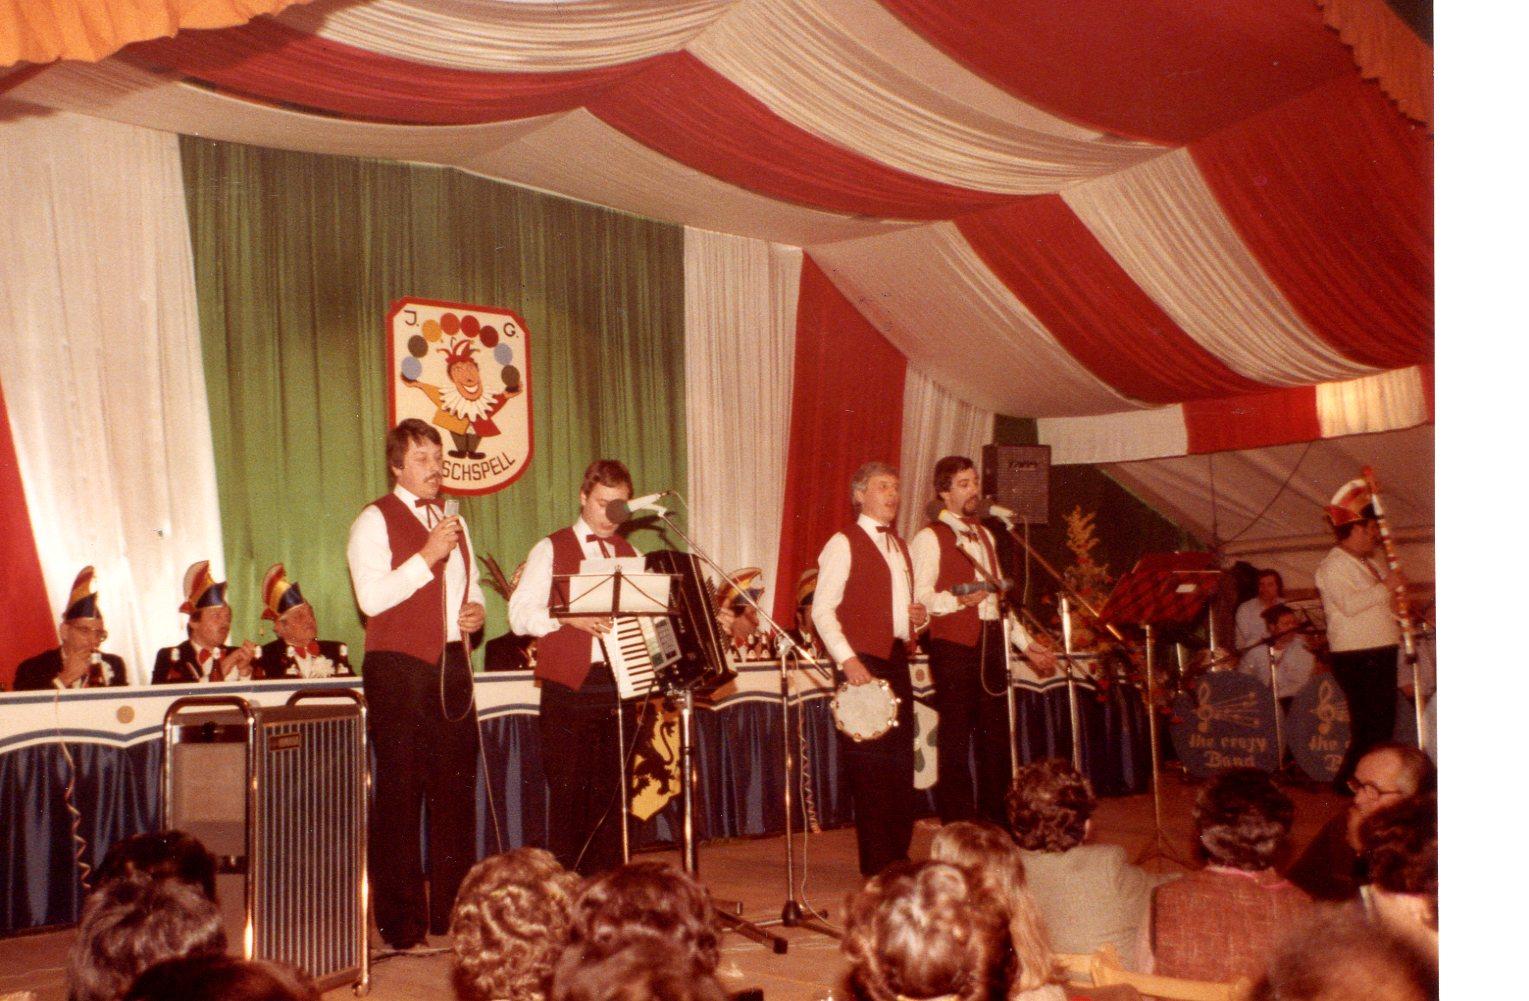 Kappensitzung 1981 - Bild 2